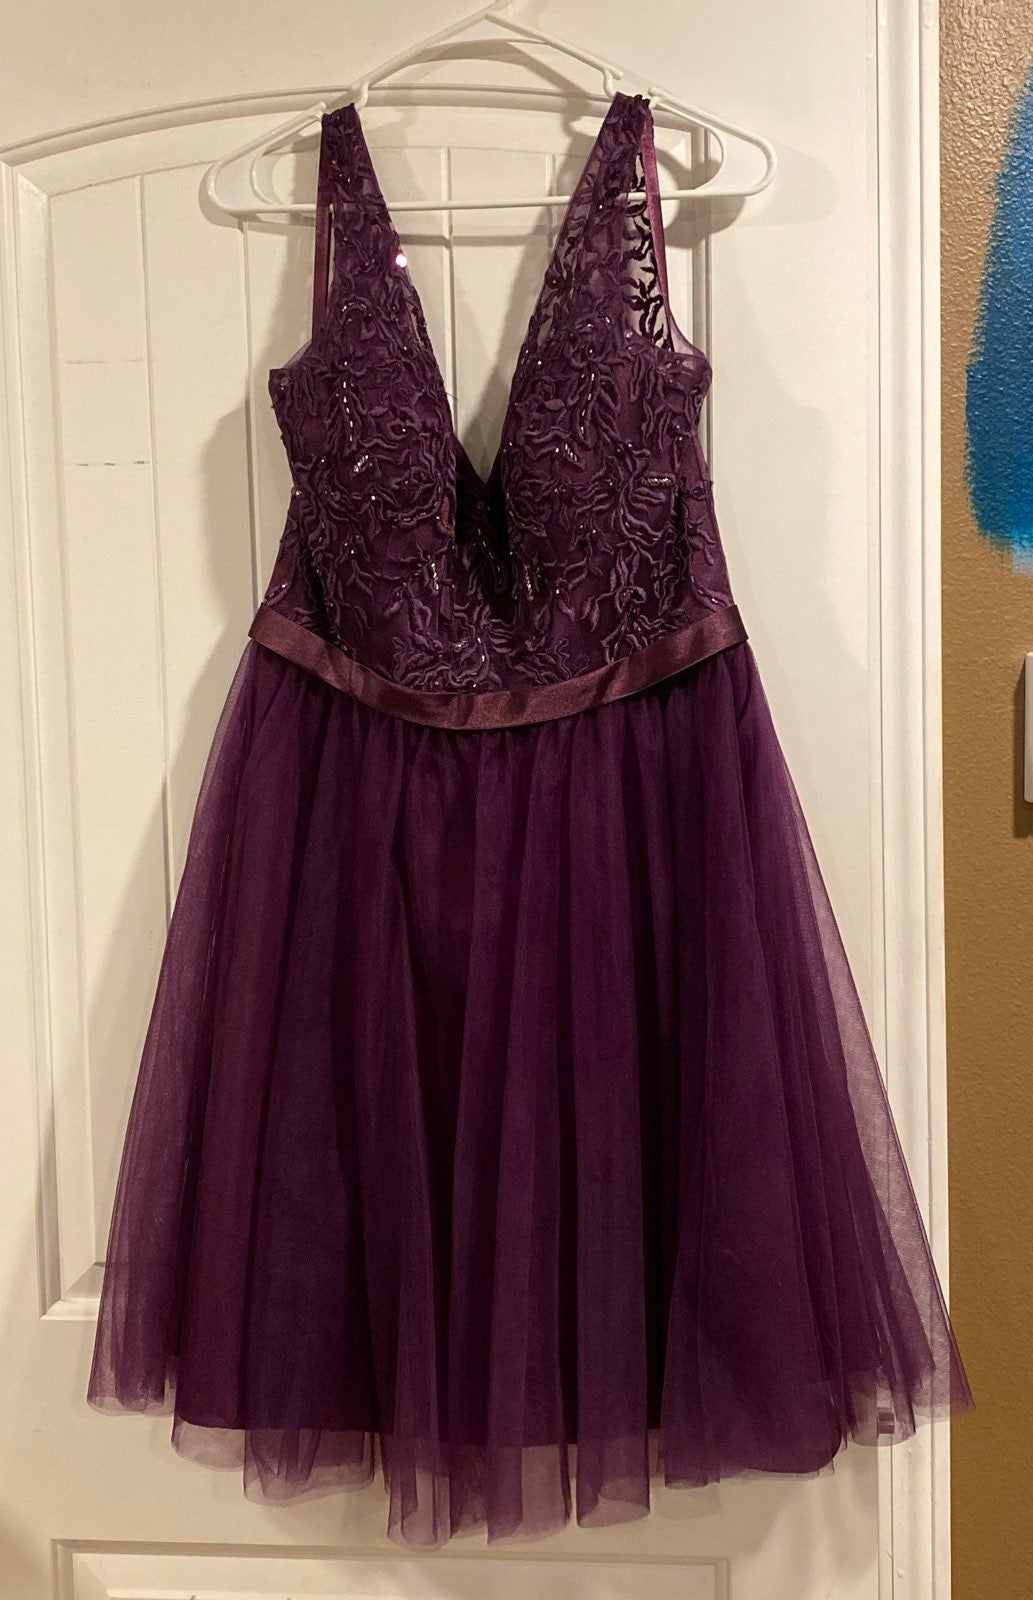 Mori Lee bridesmaid/prom dress